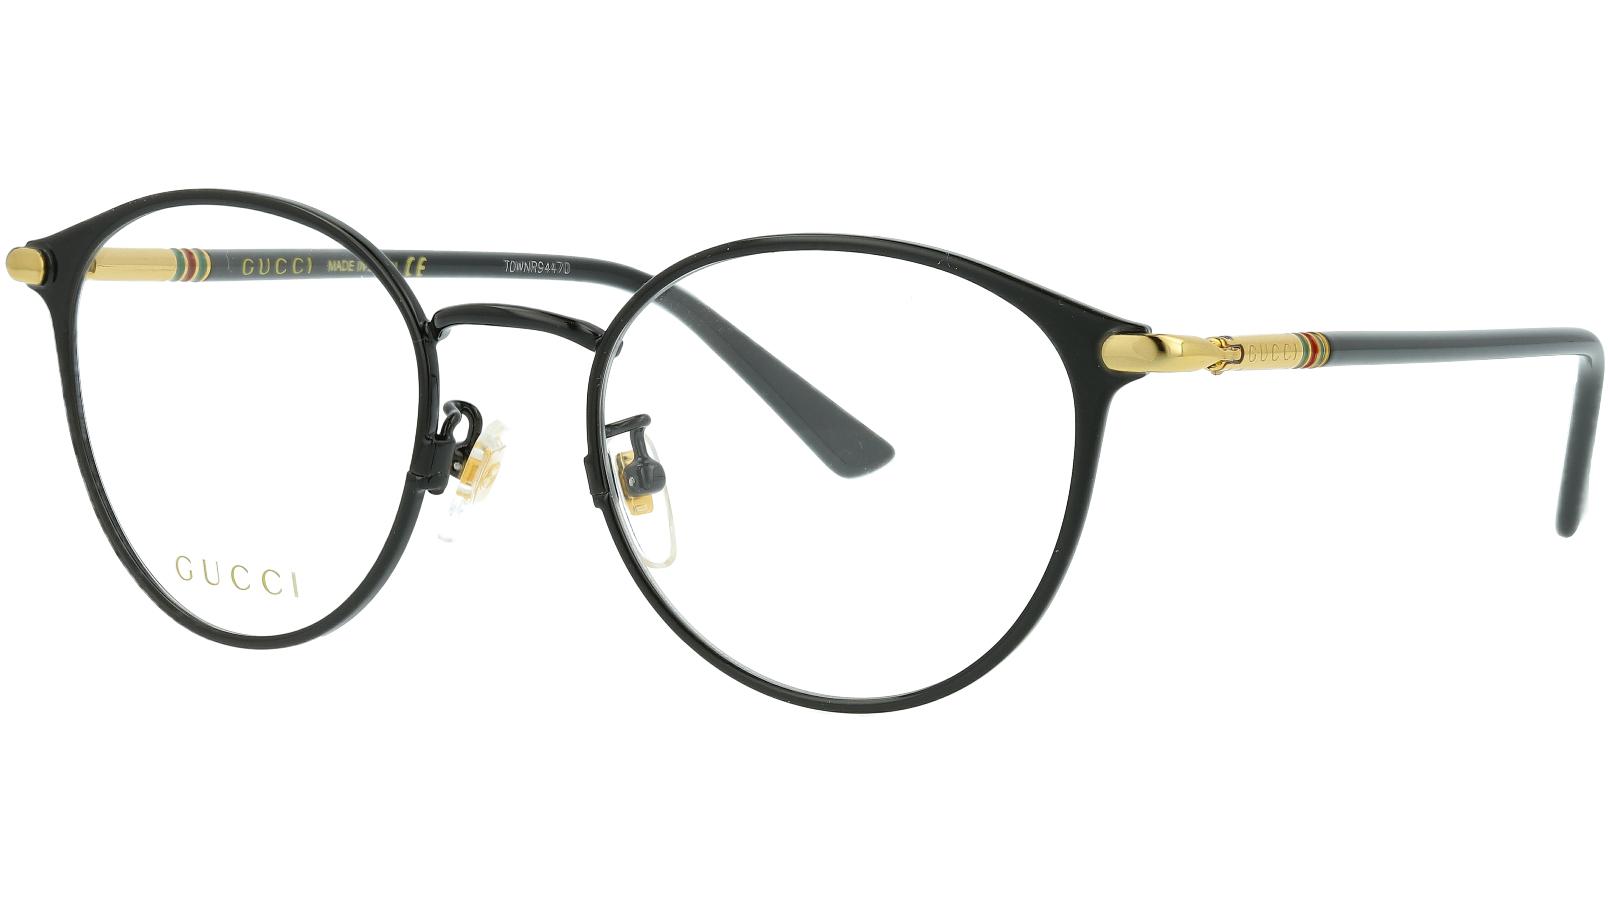 Gucci GG0611OK 001 51 Black Round Glasses